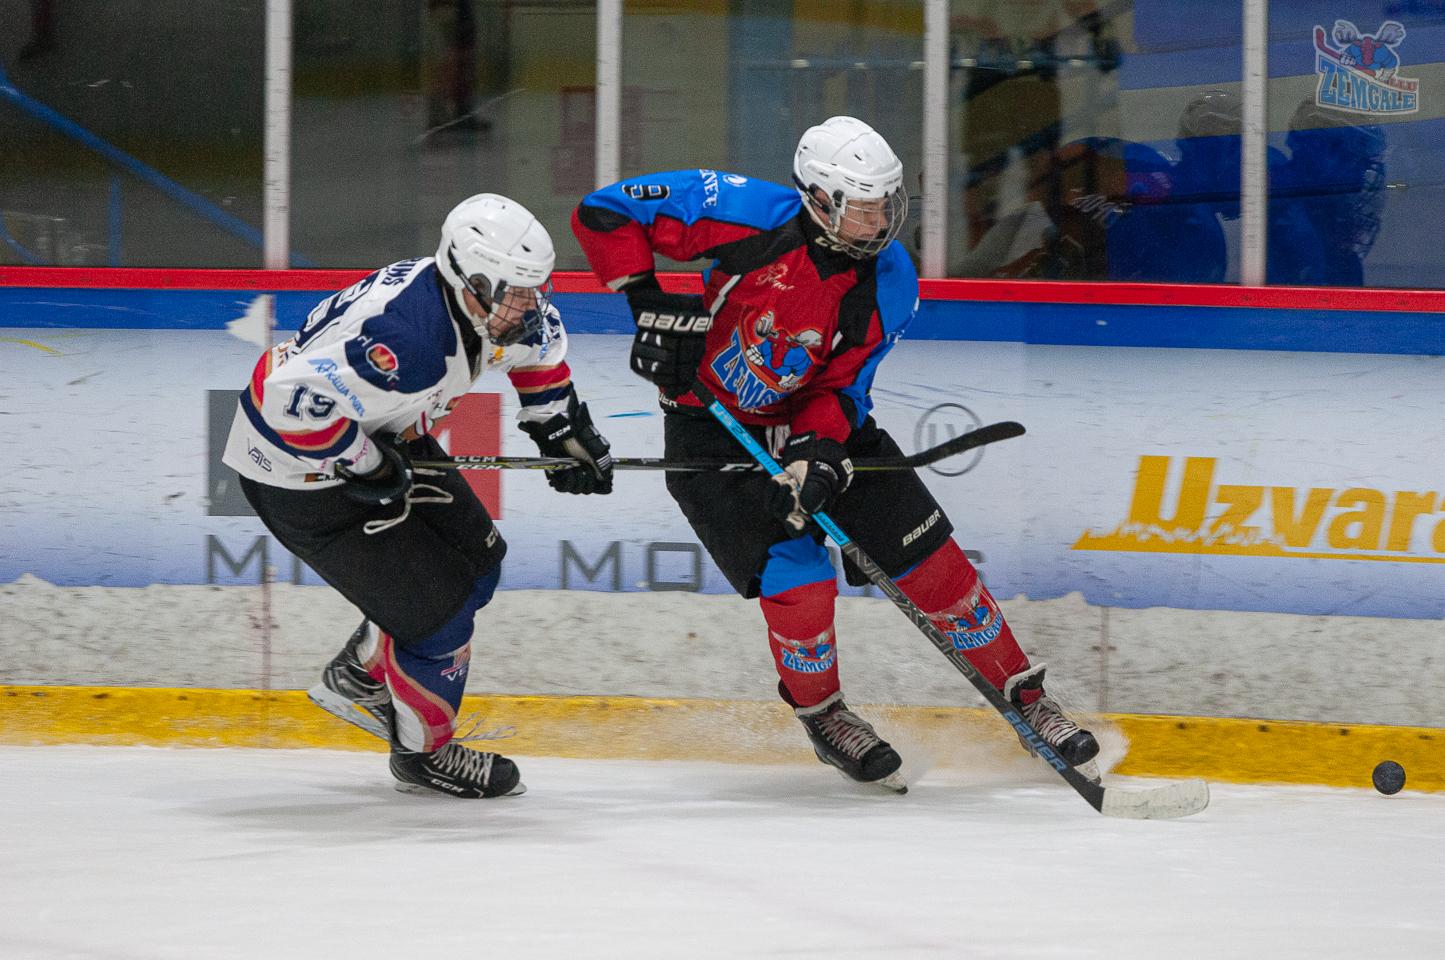 Jelgavas hokeja skola JLSS U17 - Venta 2002 14092019-26